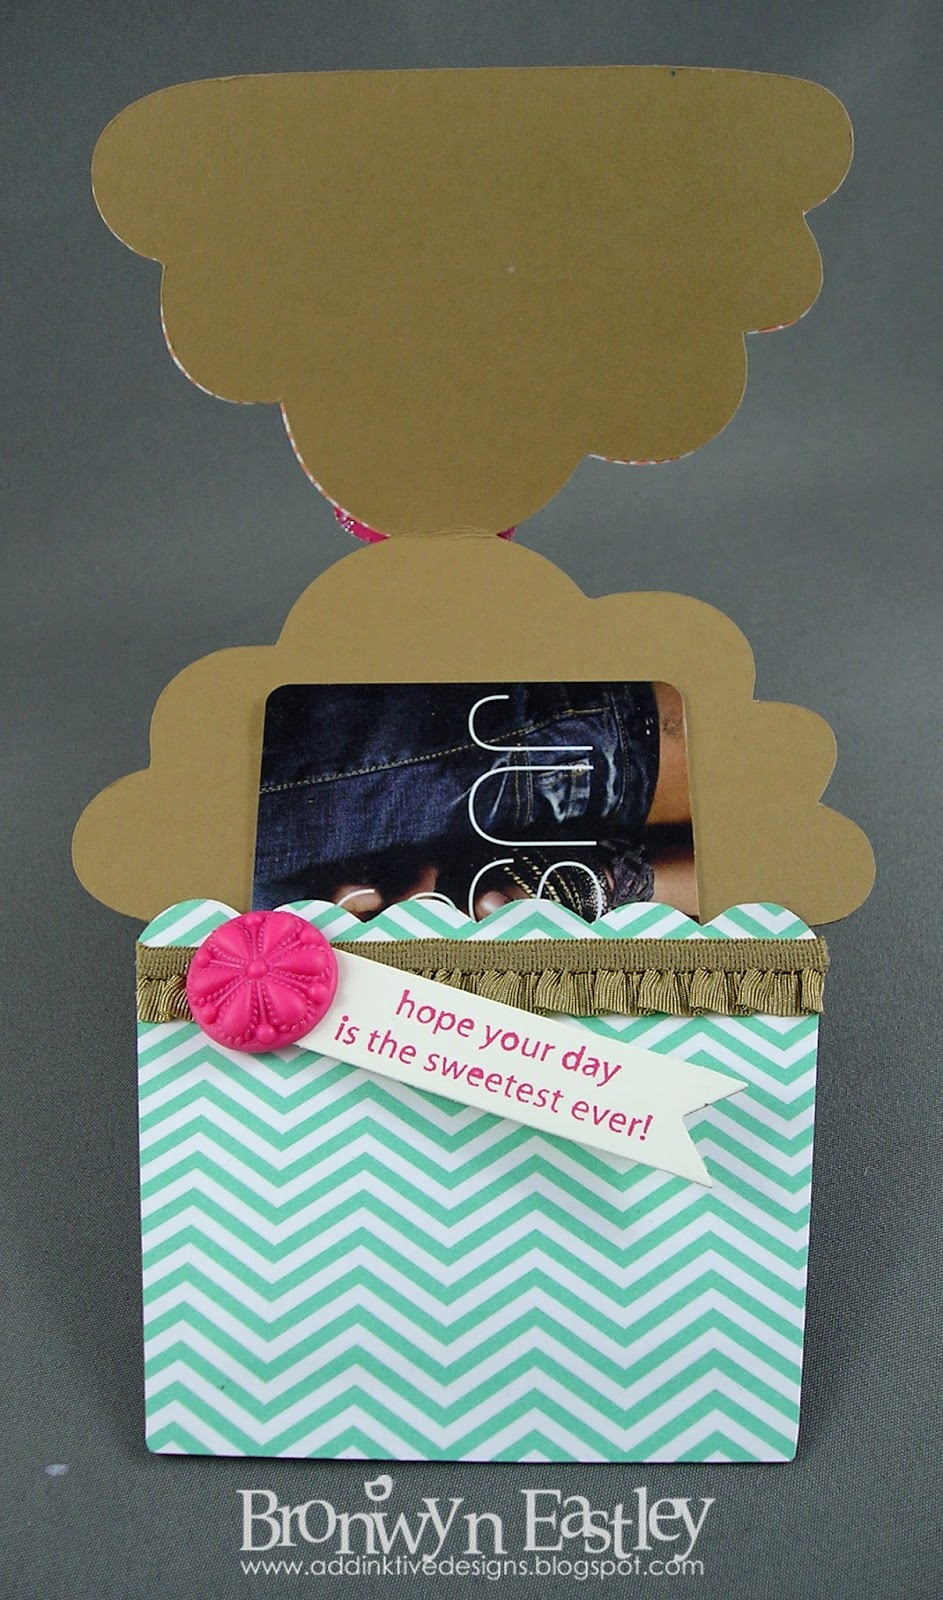 addINKtive designs at blogger: Birthday Cupcake Gift Card Holder